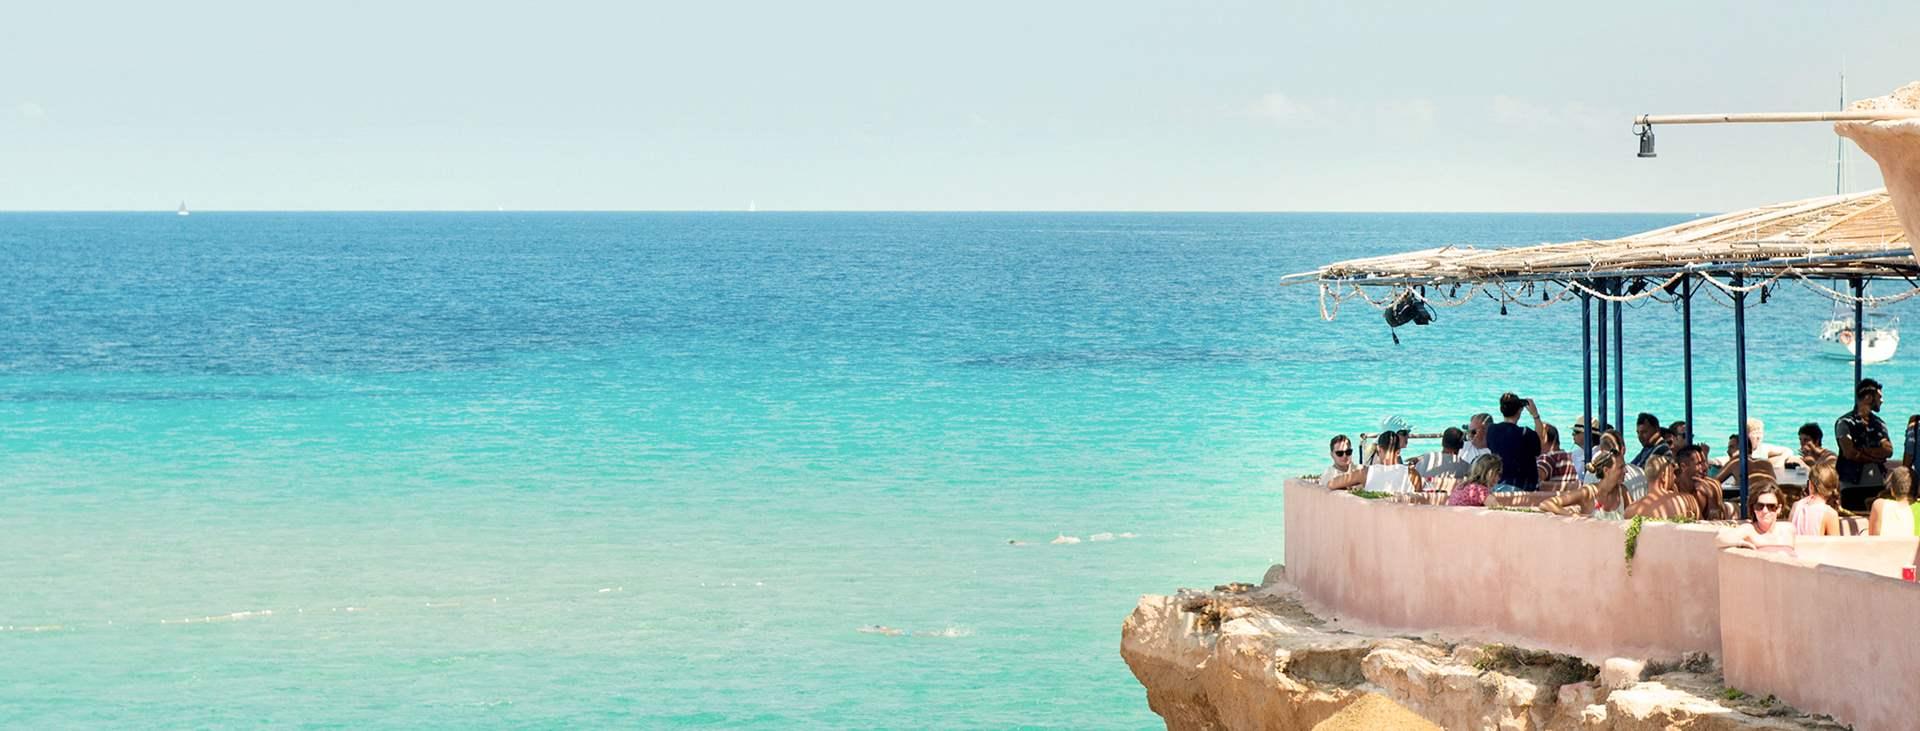 Ibiza Espanja Matkat Tjareborgilta